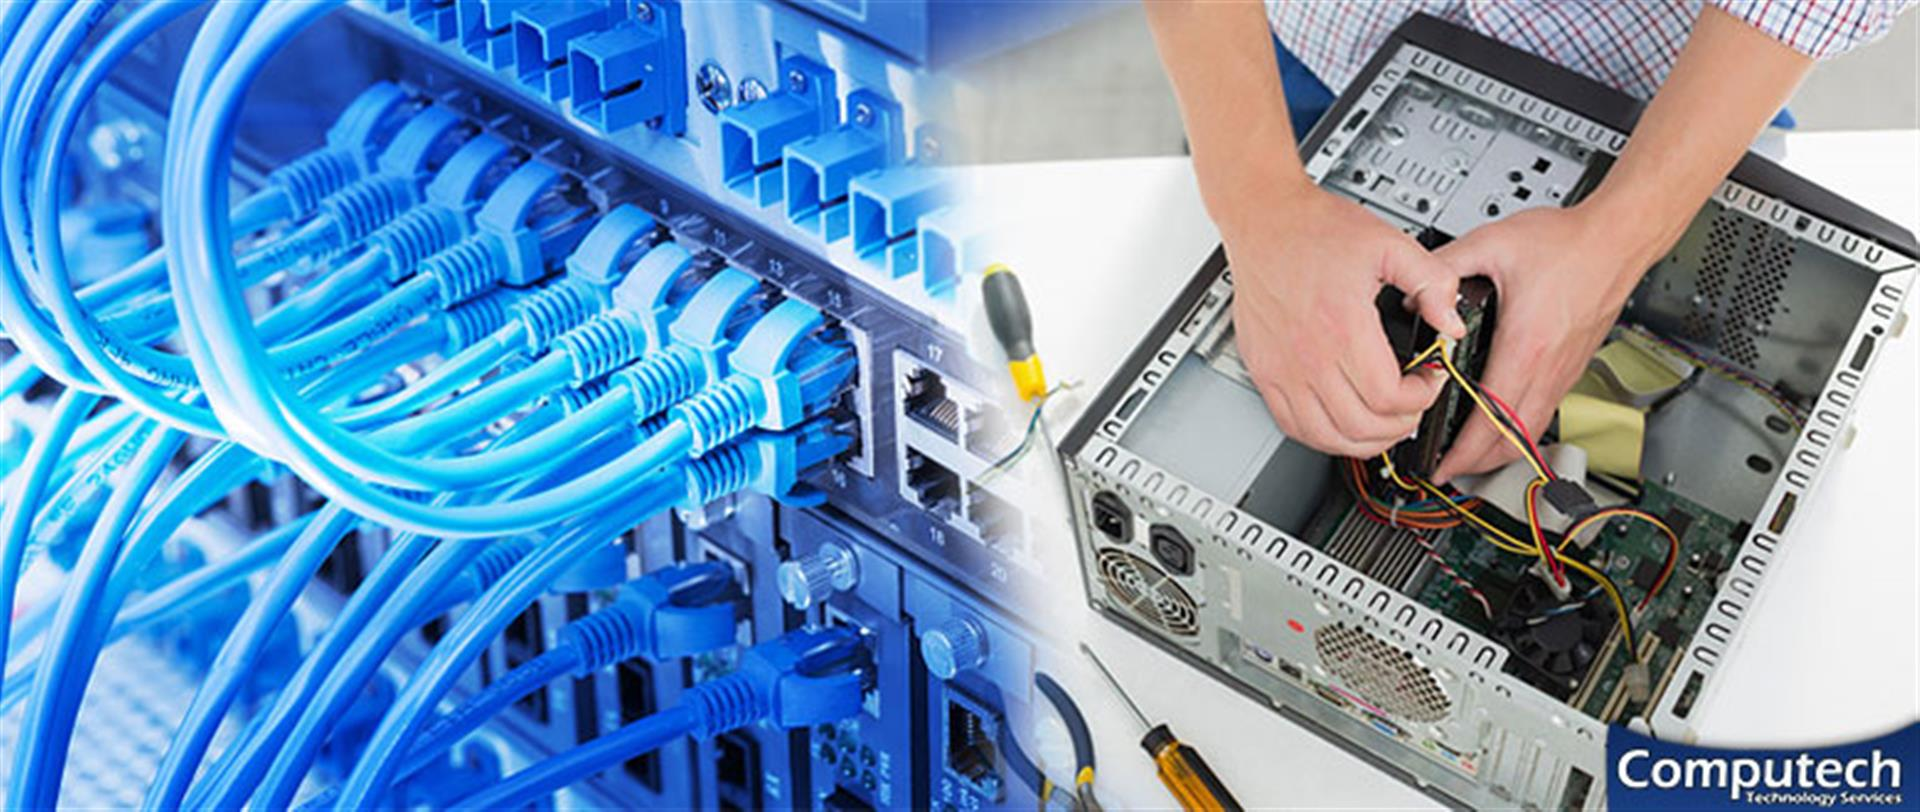 Toccoa Georgia Onsite Computer PC & Printer Repair, Networks, Voice & Data Cabling Contractors